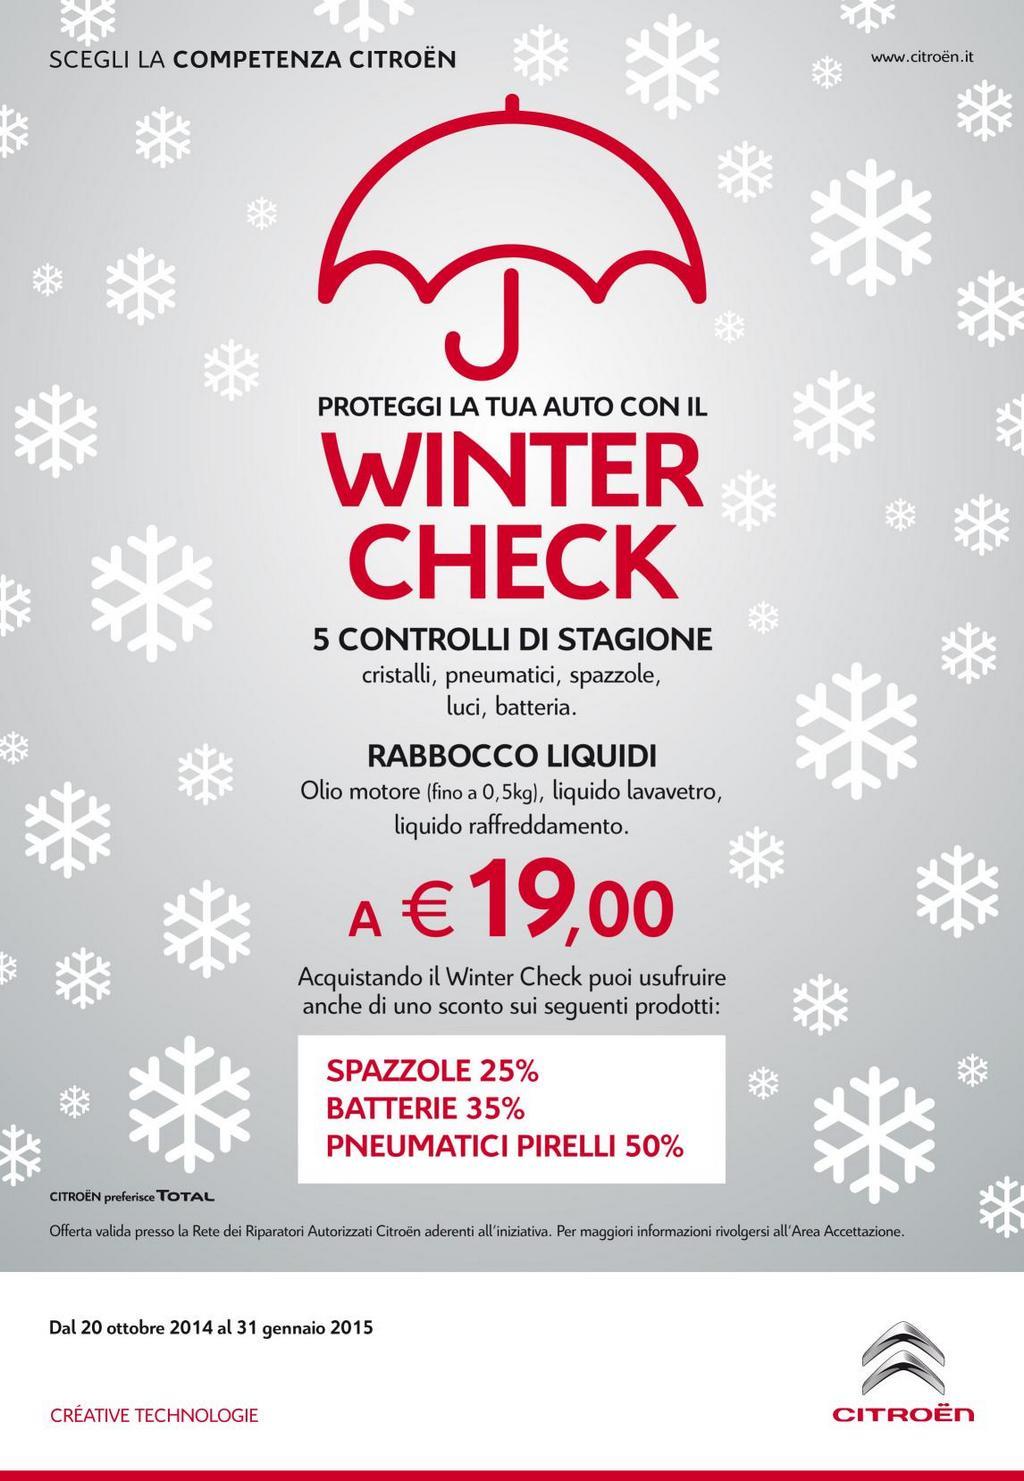 Citroen Winter Check 2014